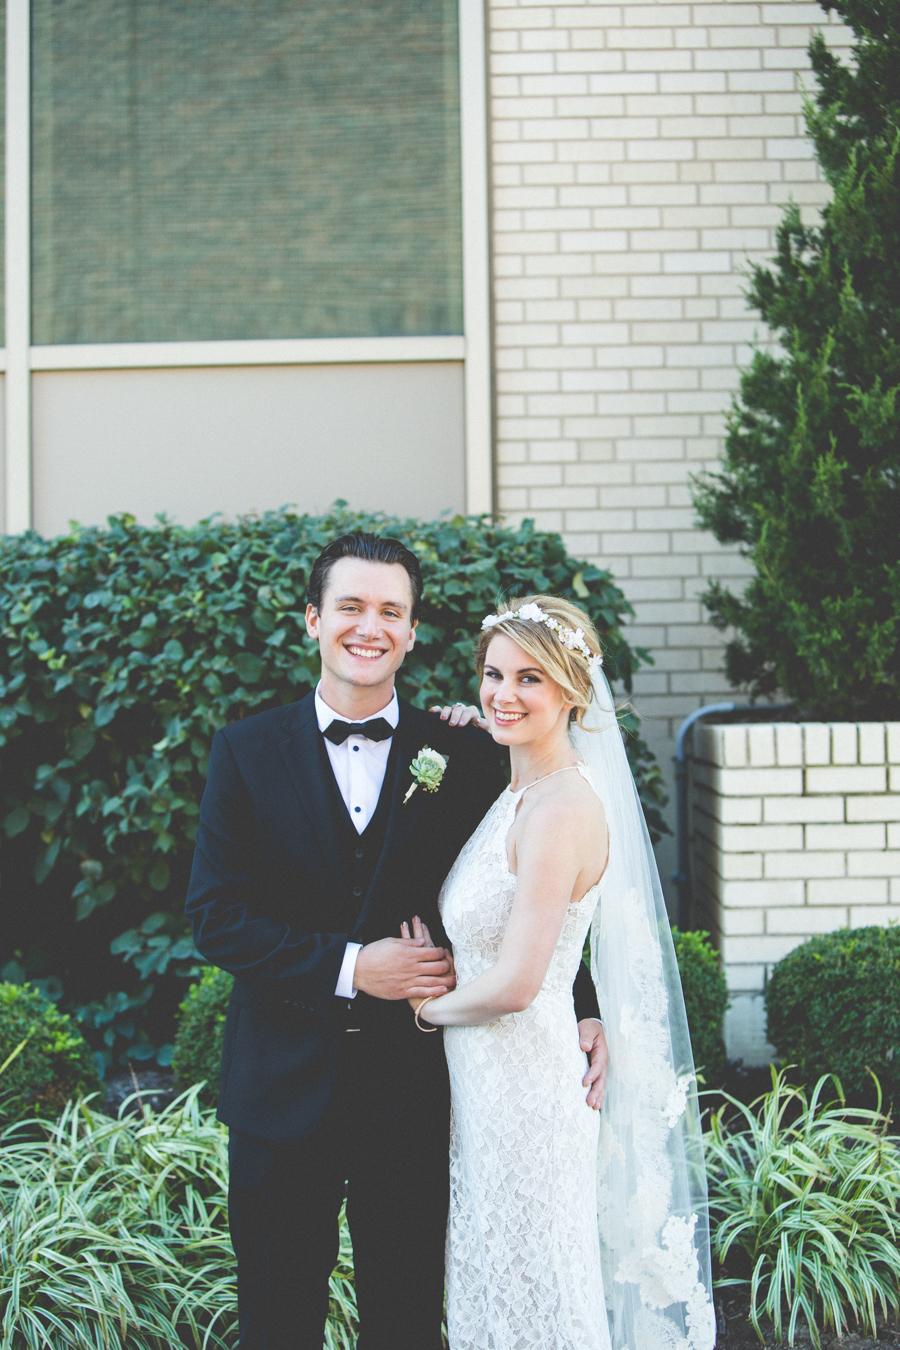 nicole_reid_wedding_blog-1-5